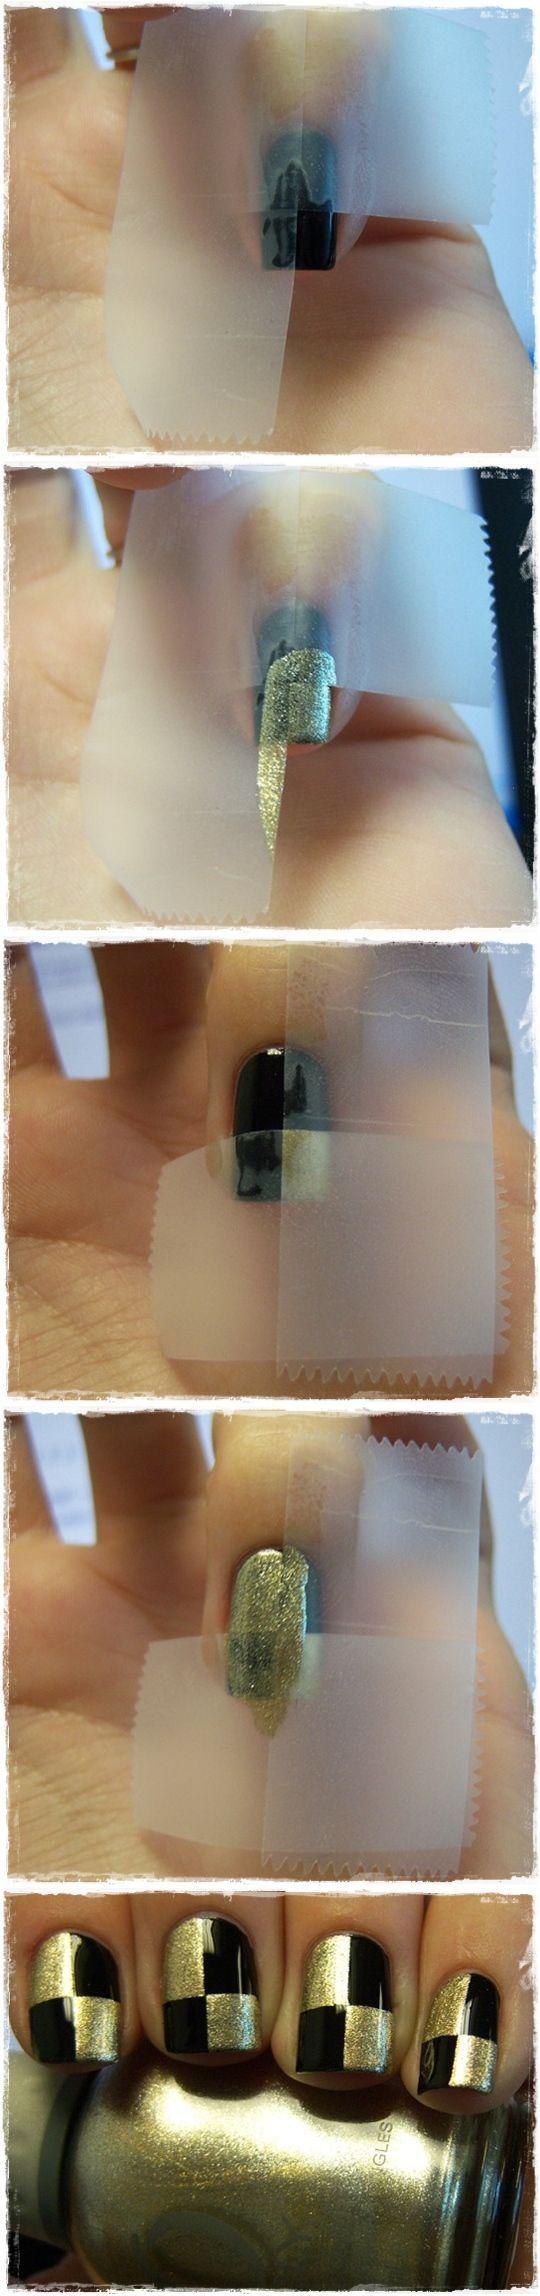 Chessboard alike nails